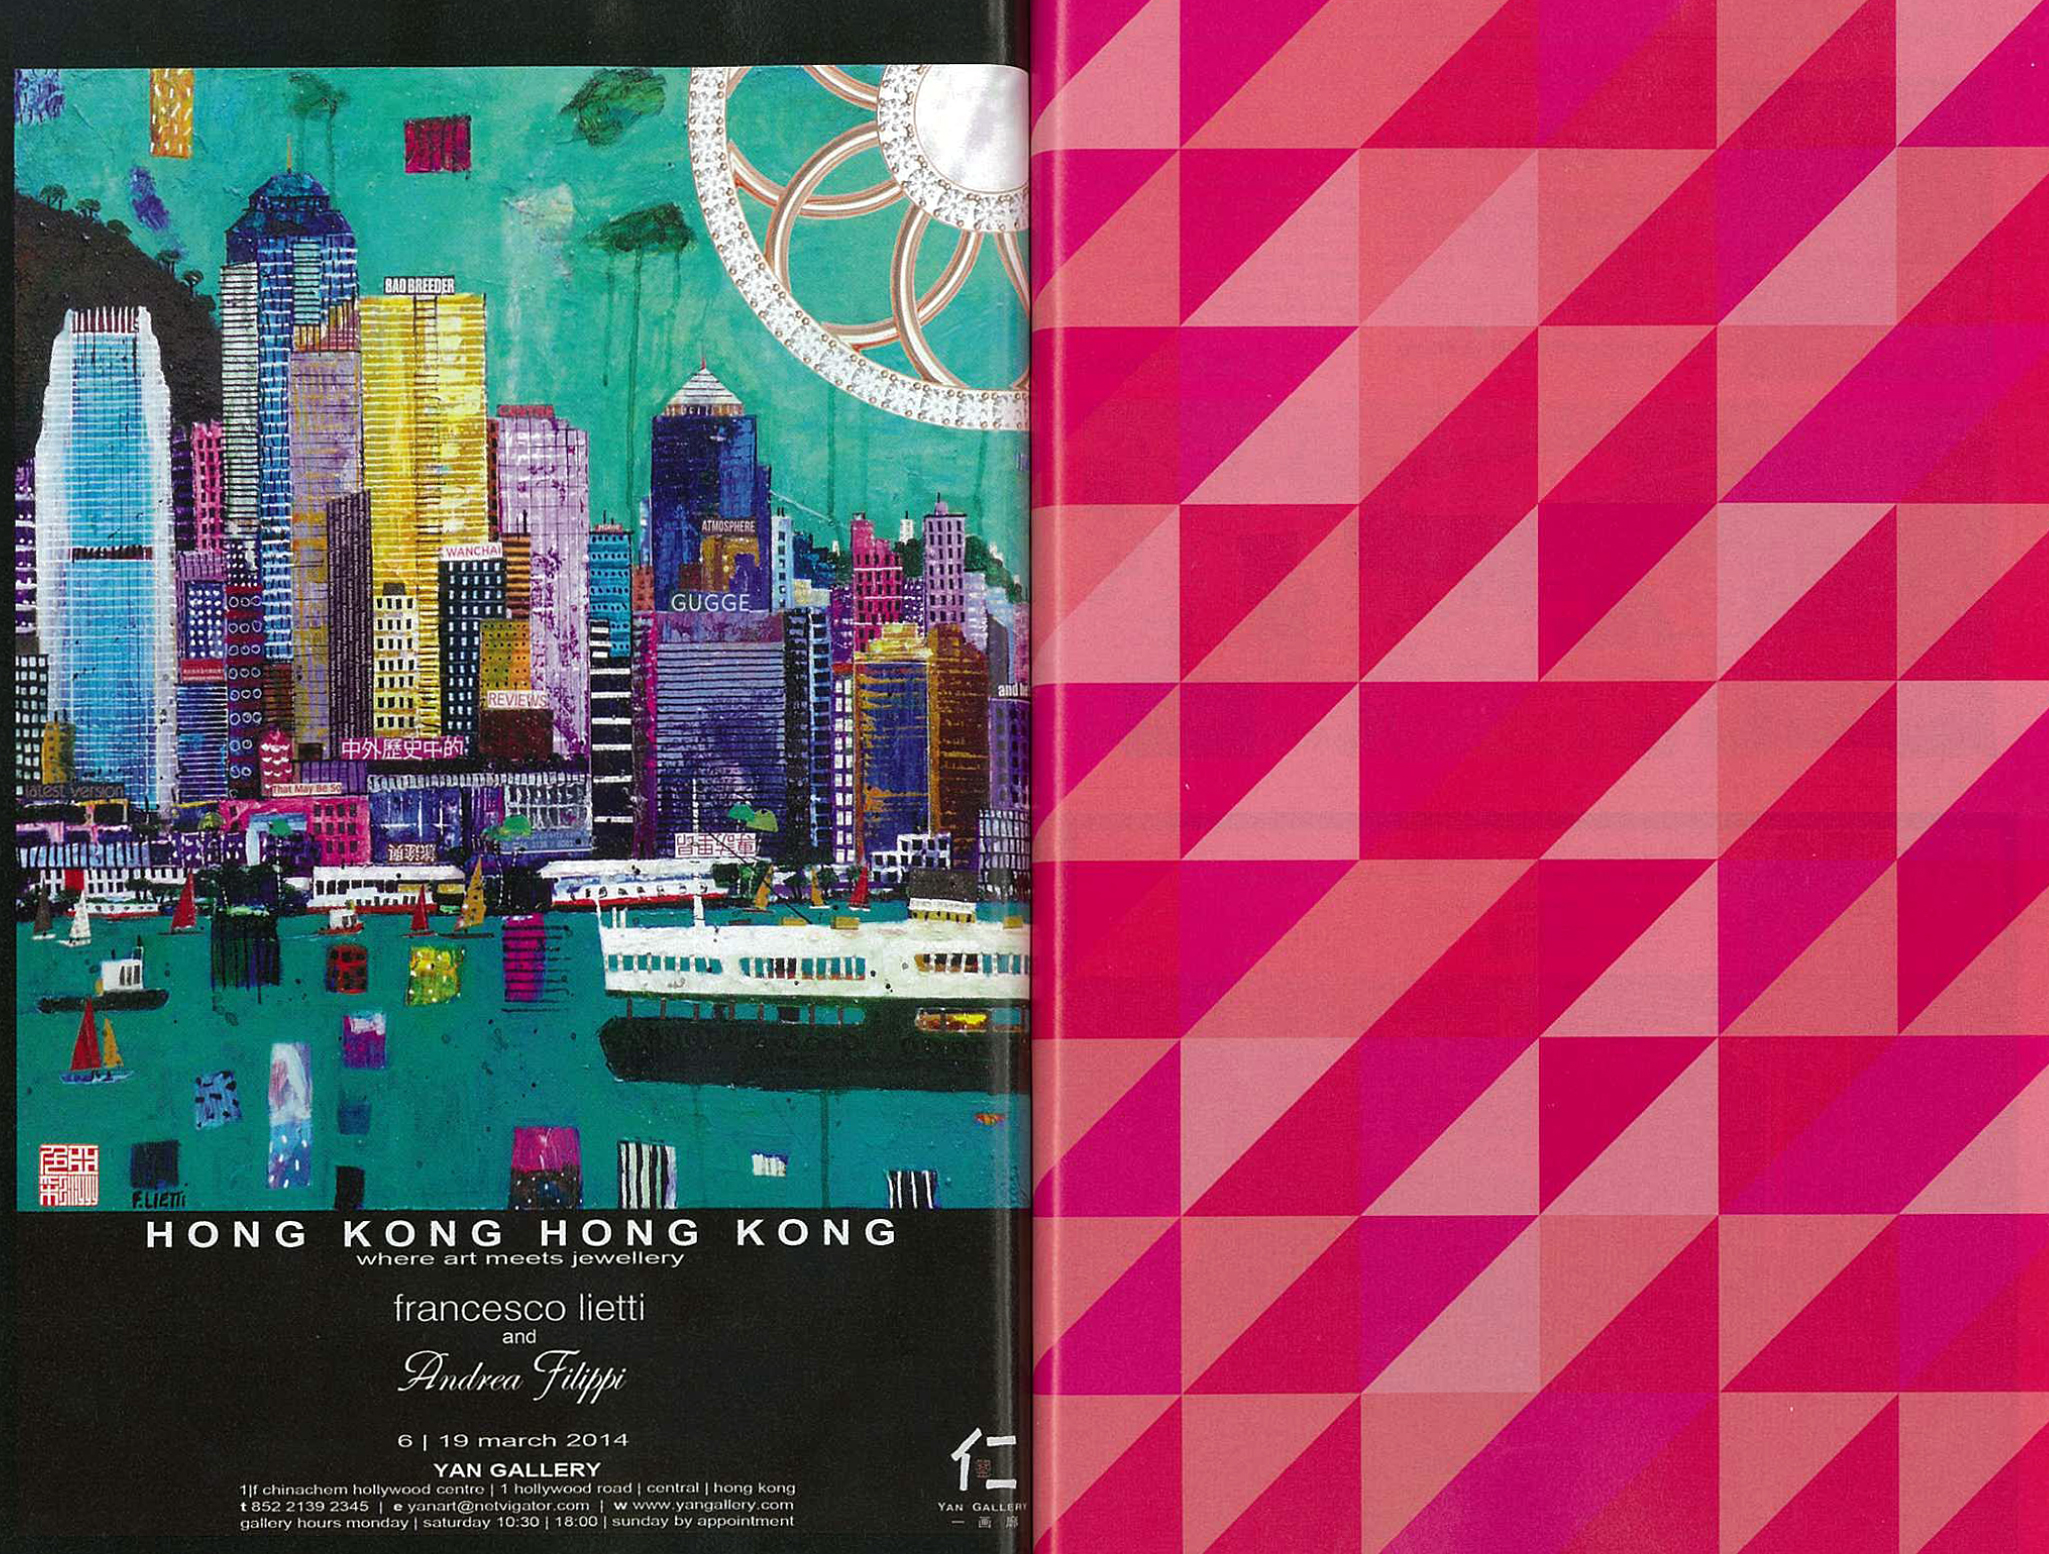 201403-HK Artguide AD.jpg